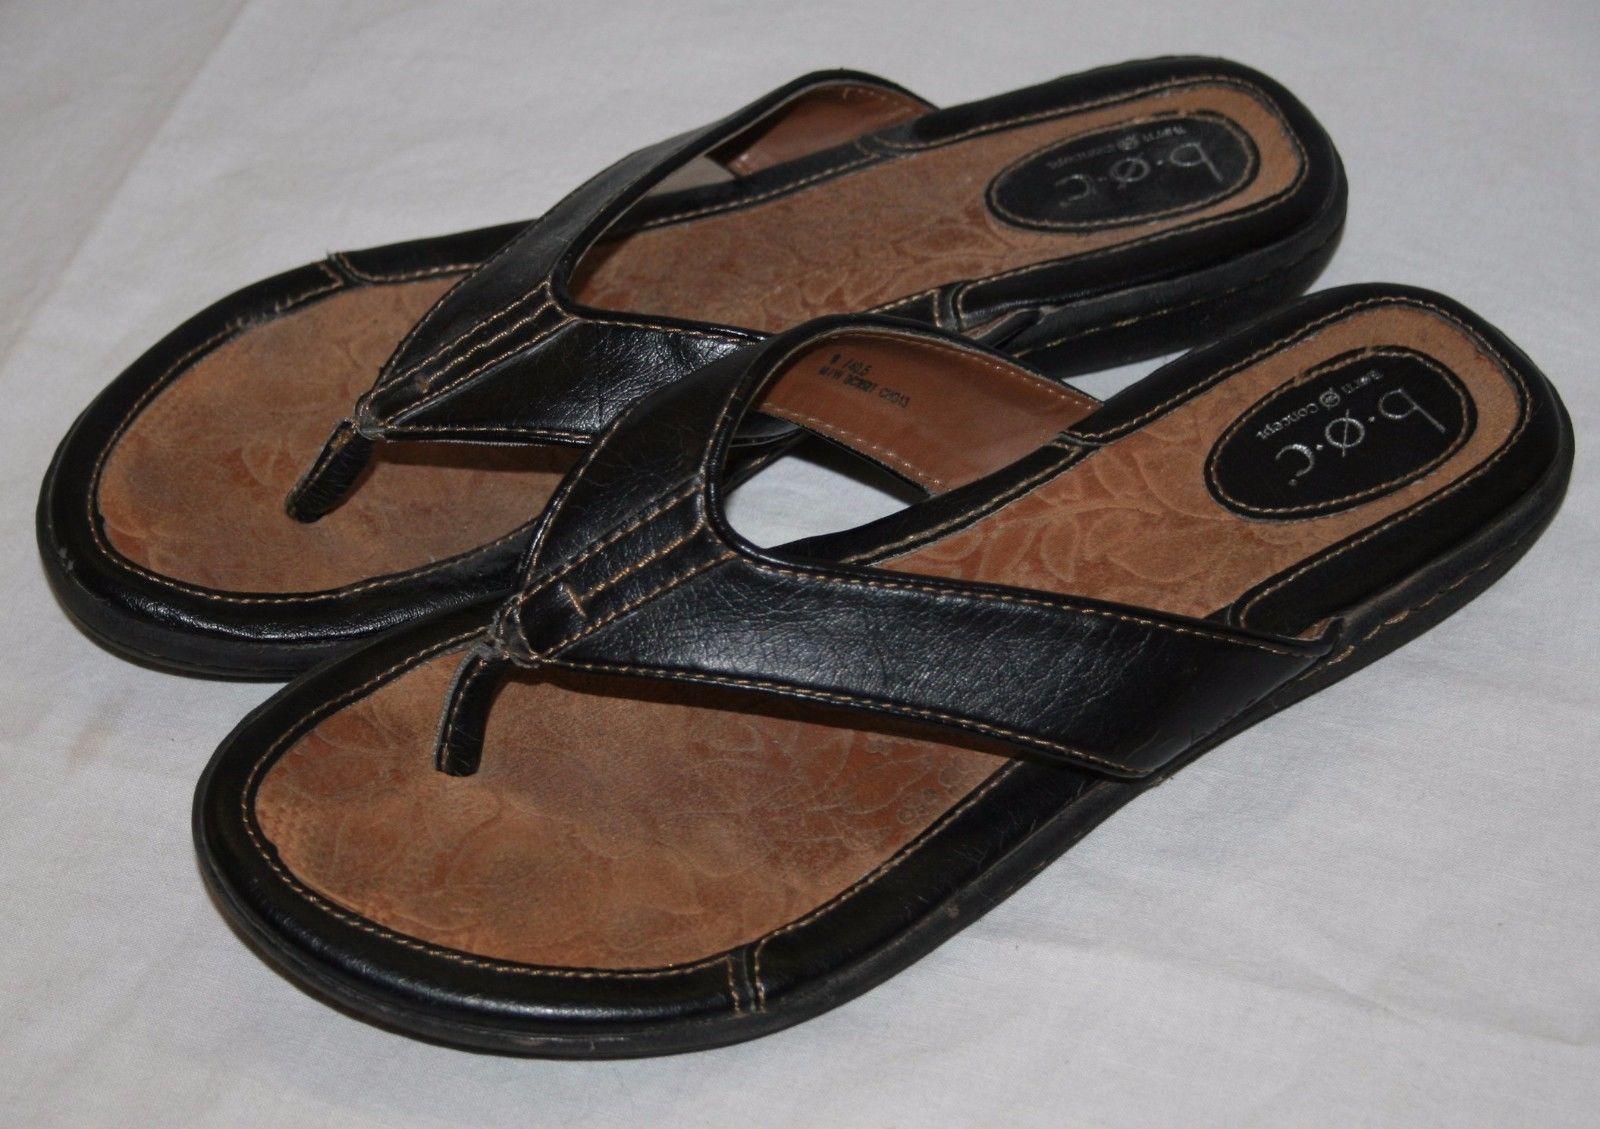 b28887a70853 B.O.C. Born Concept BOC Black Leather Thong Flip Flops Womens Sandals 9 40.5